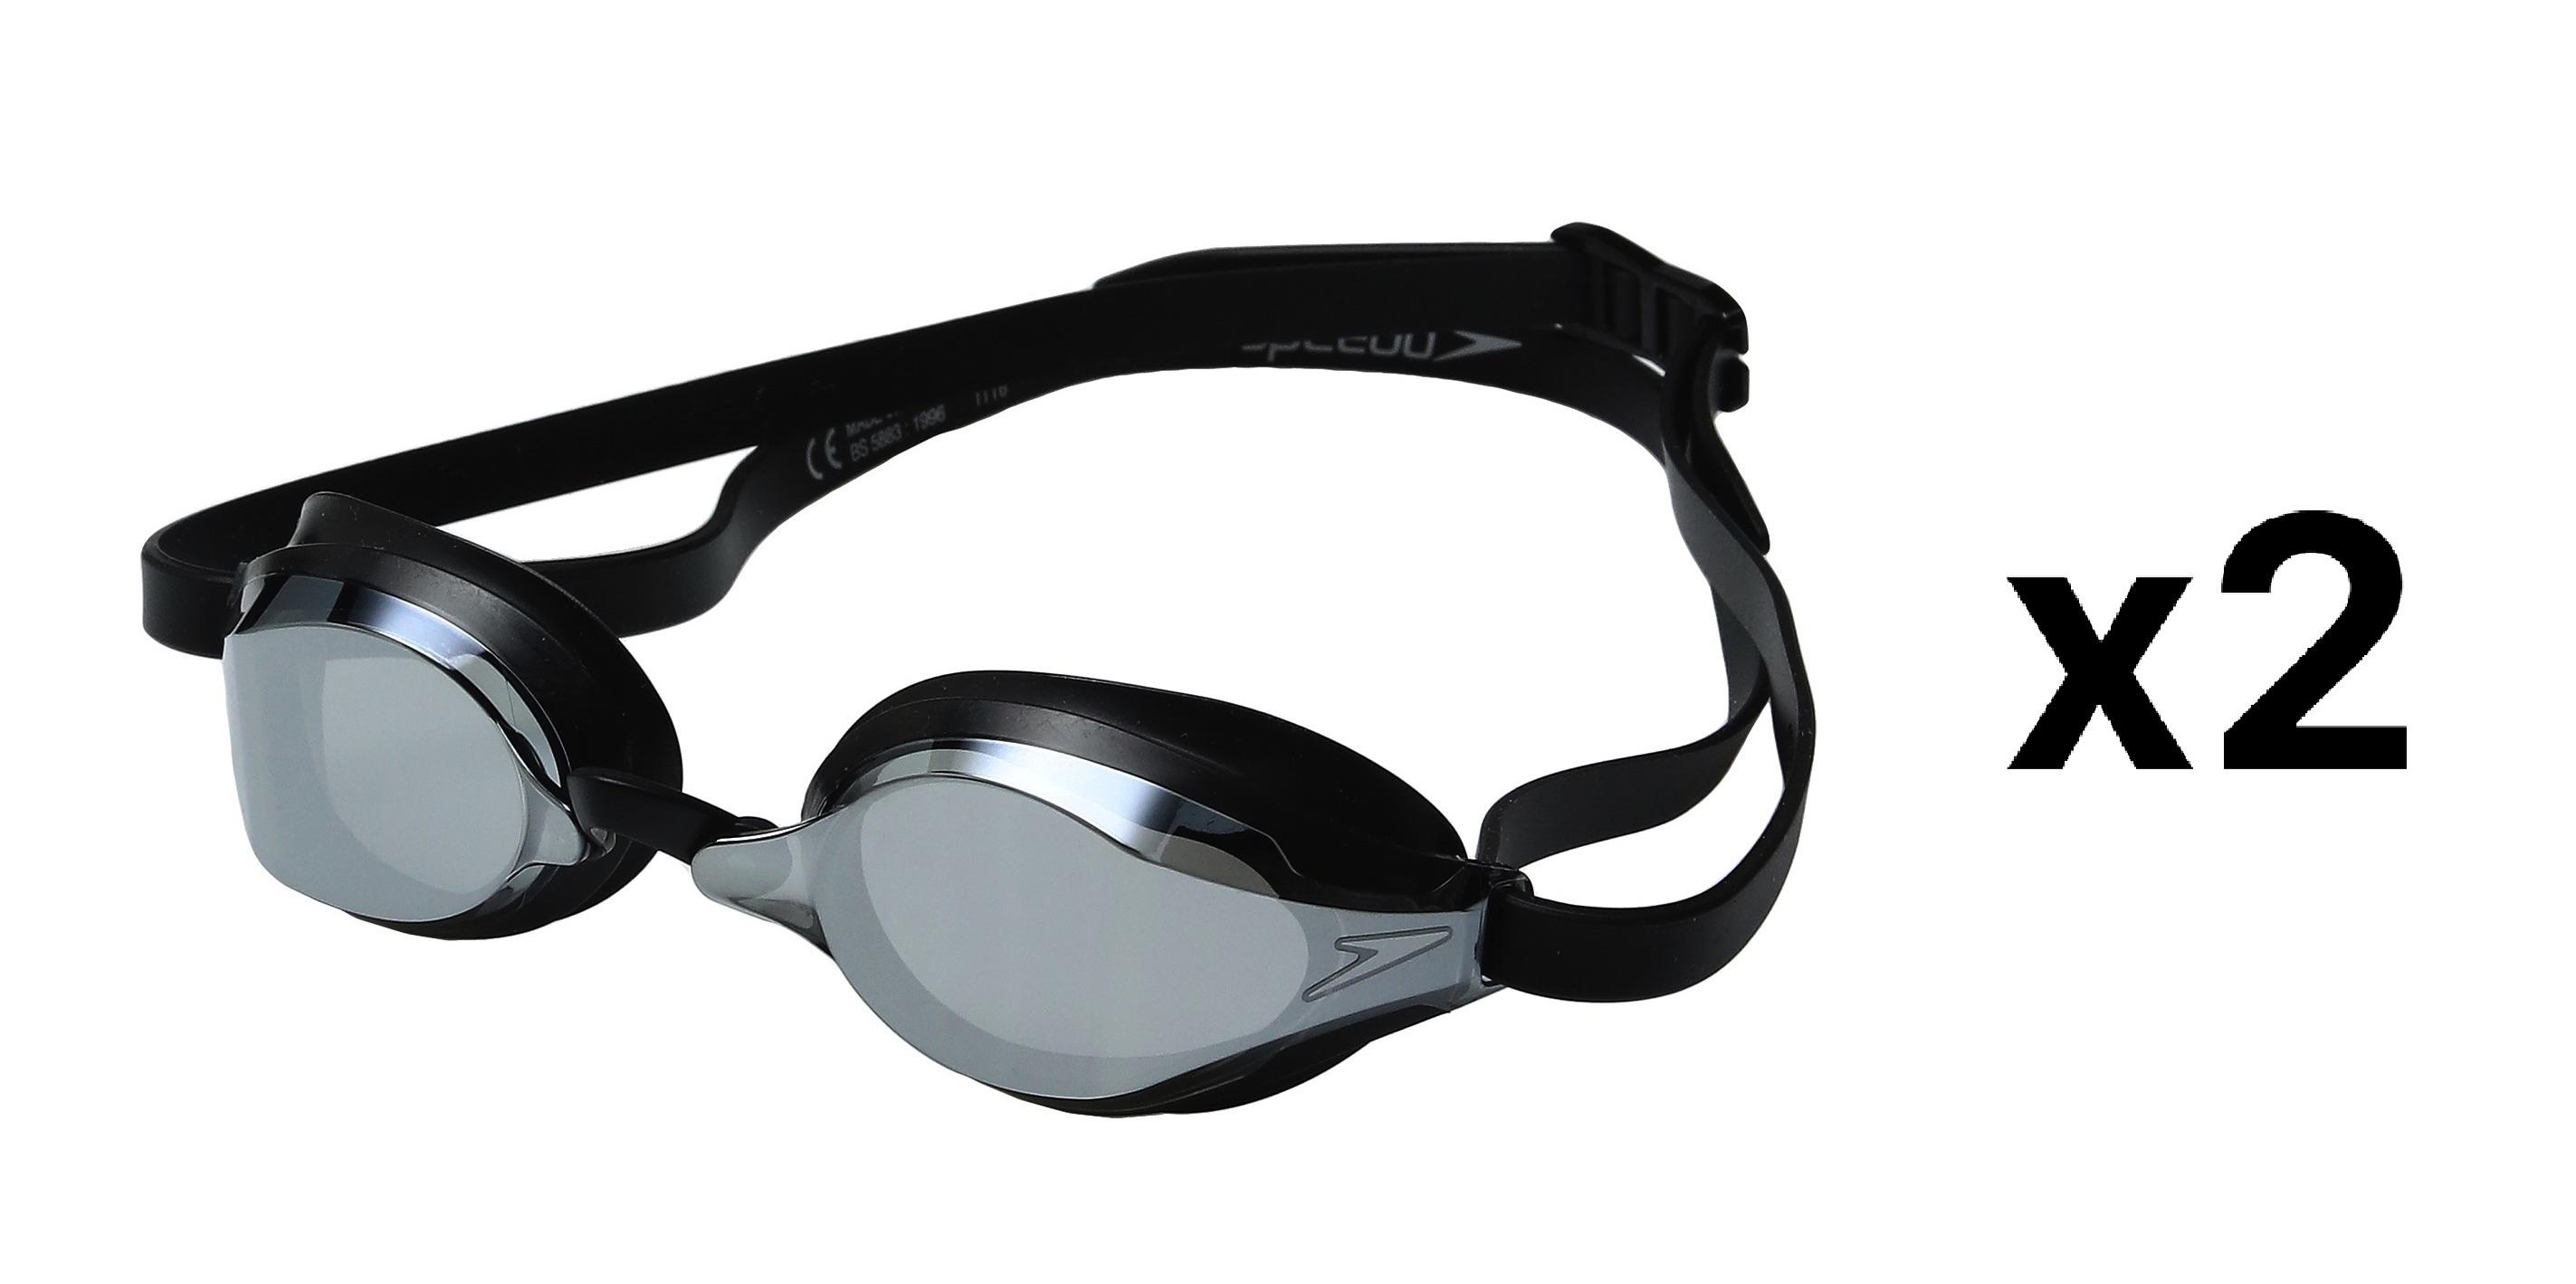 6581ef88e50e6 Speedo Speed Socket 2.0 Mirrored Swim Goggle-One Size, Black/Silver ...